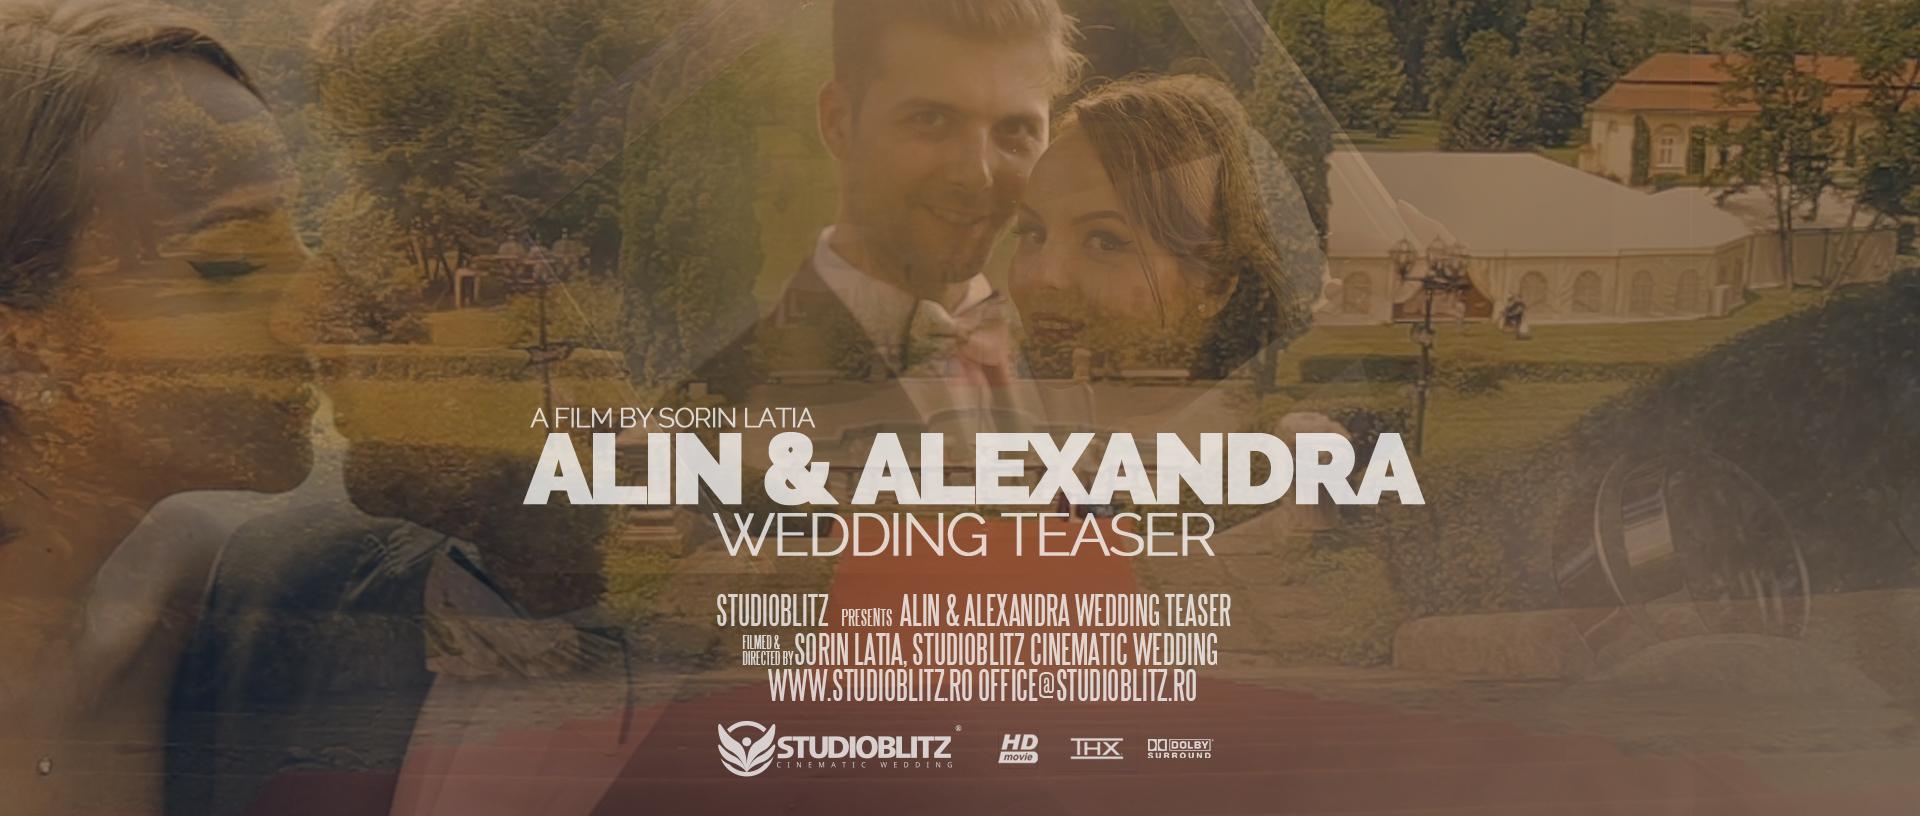 coperta-filmare-palatul-brukenthal-avrig-prezentare-nunta-teaser-alin-alexandra